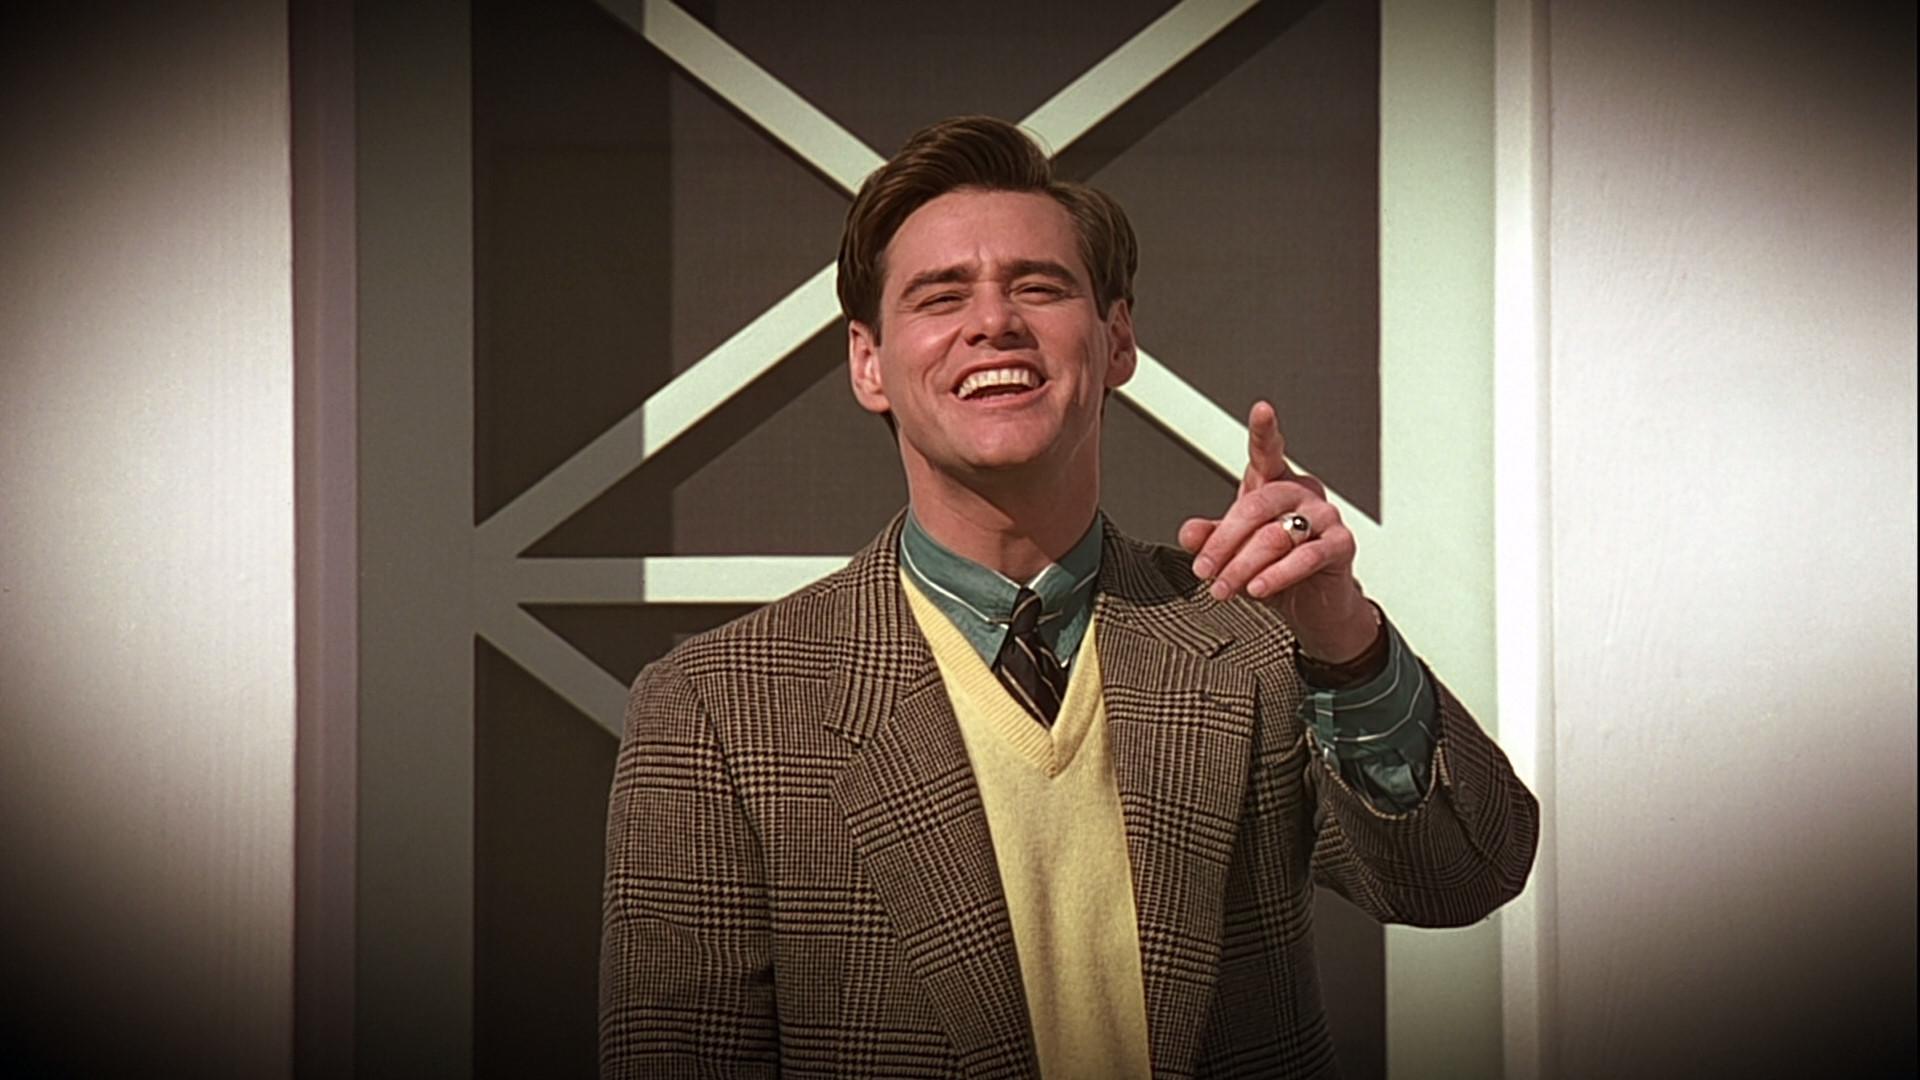 Uitslag POLL: De films van Jim Carrey